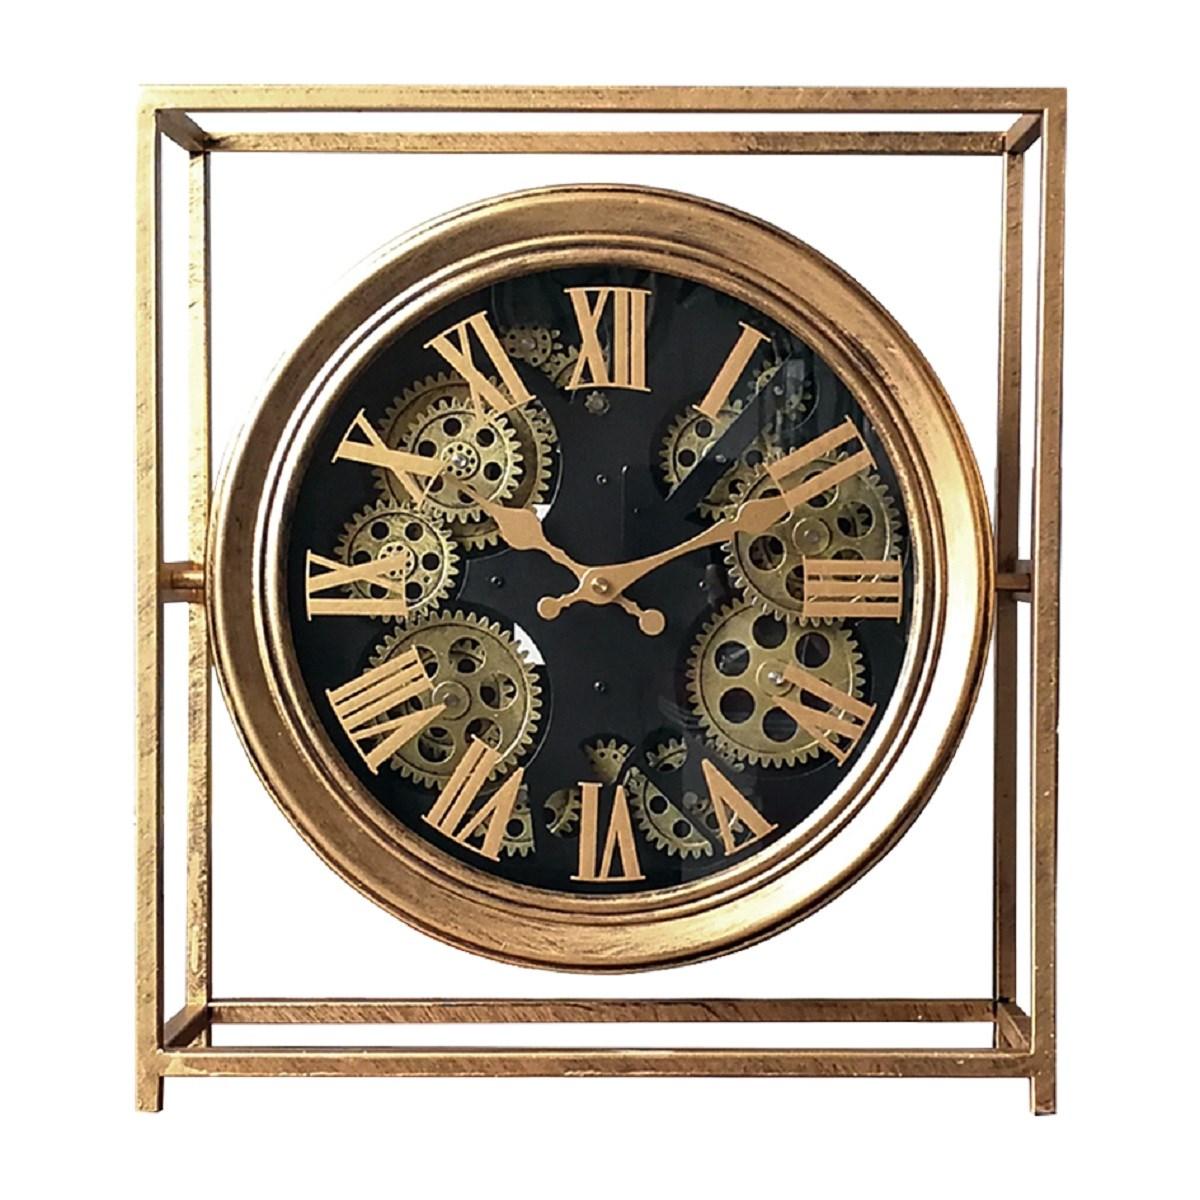 Horloge mécanisme carrée en métal noir